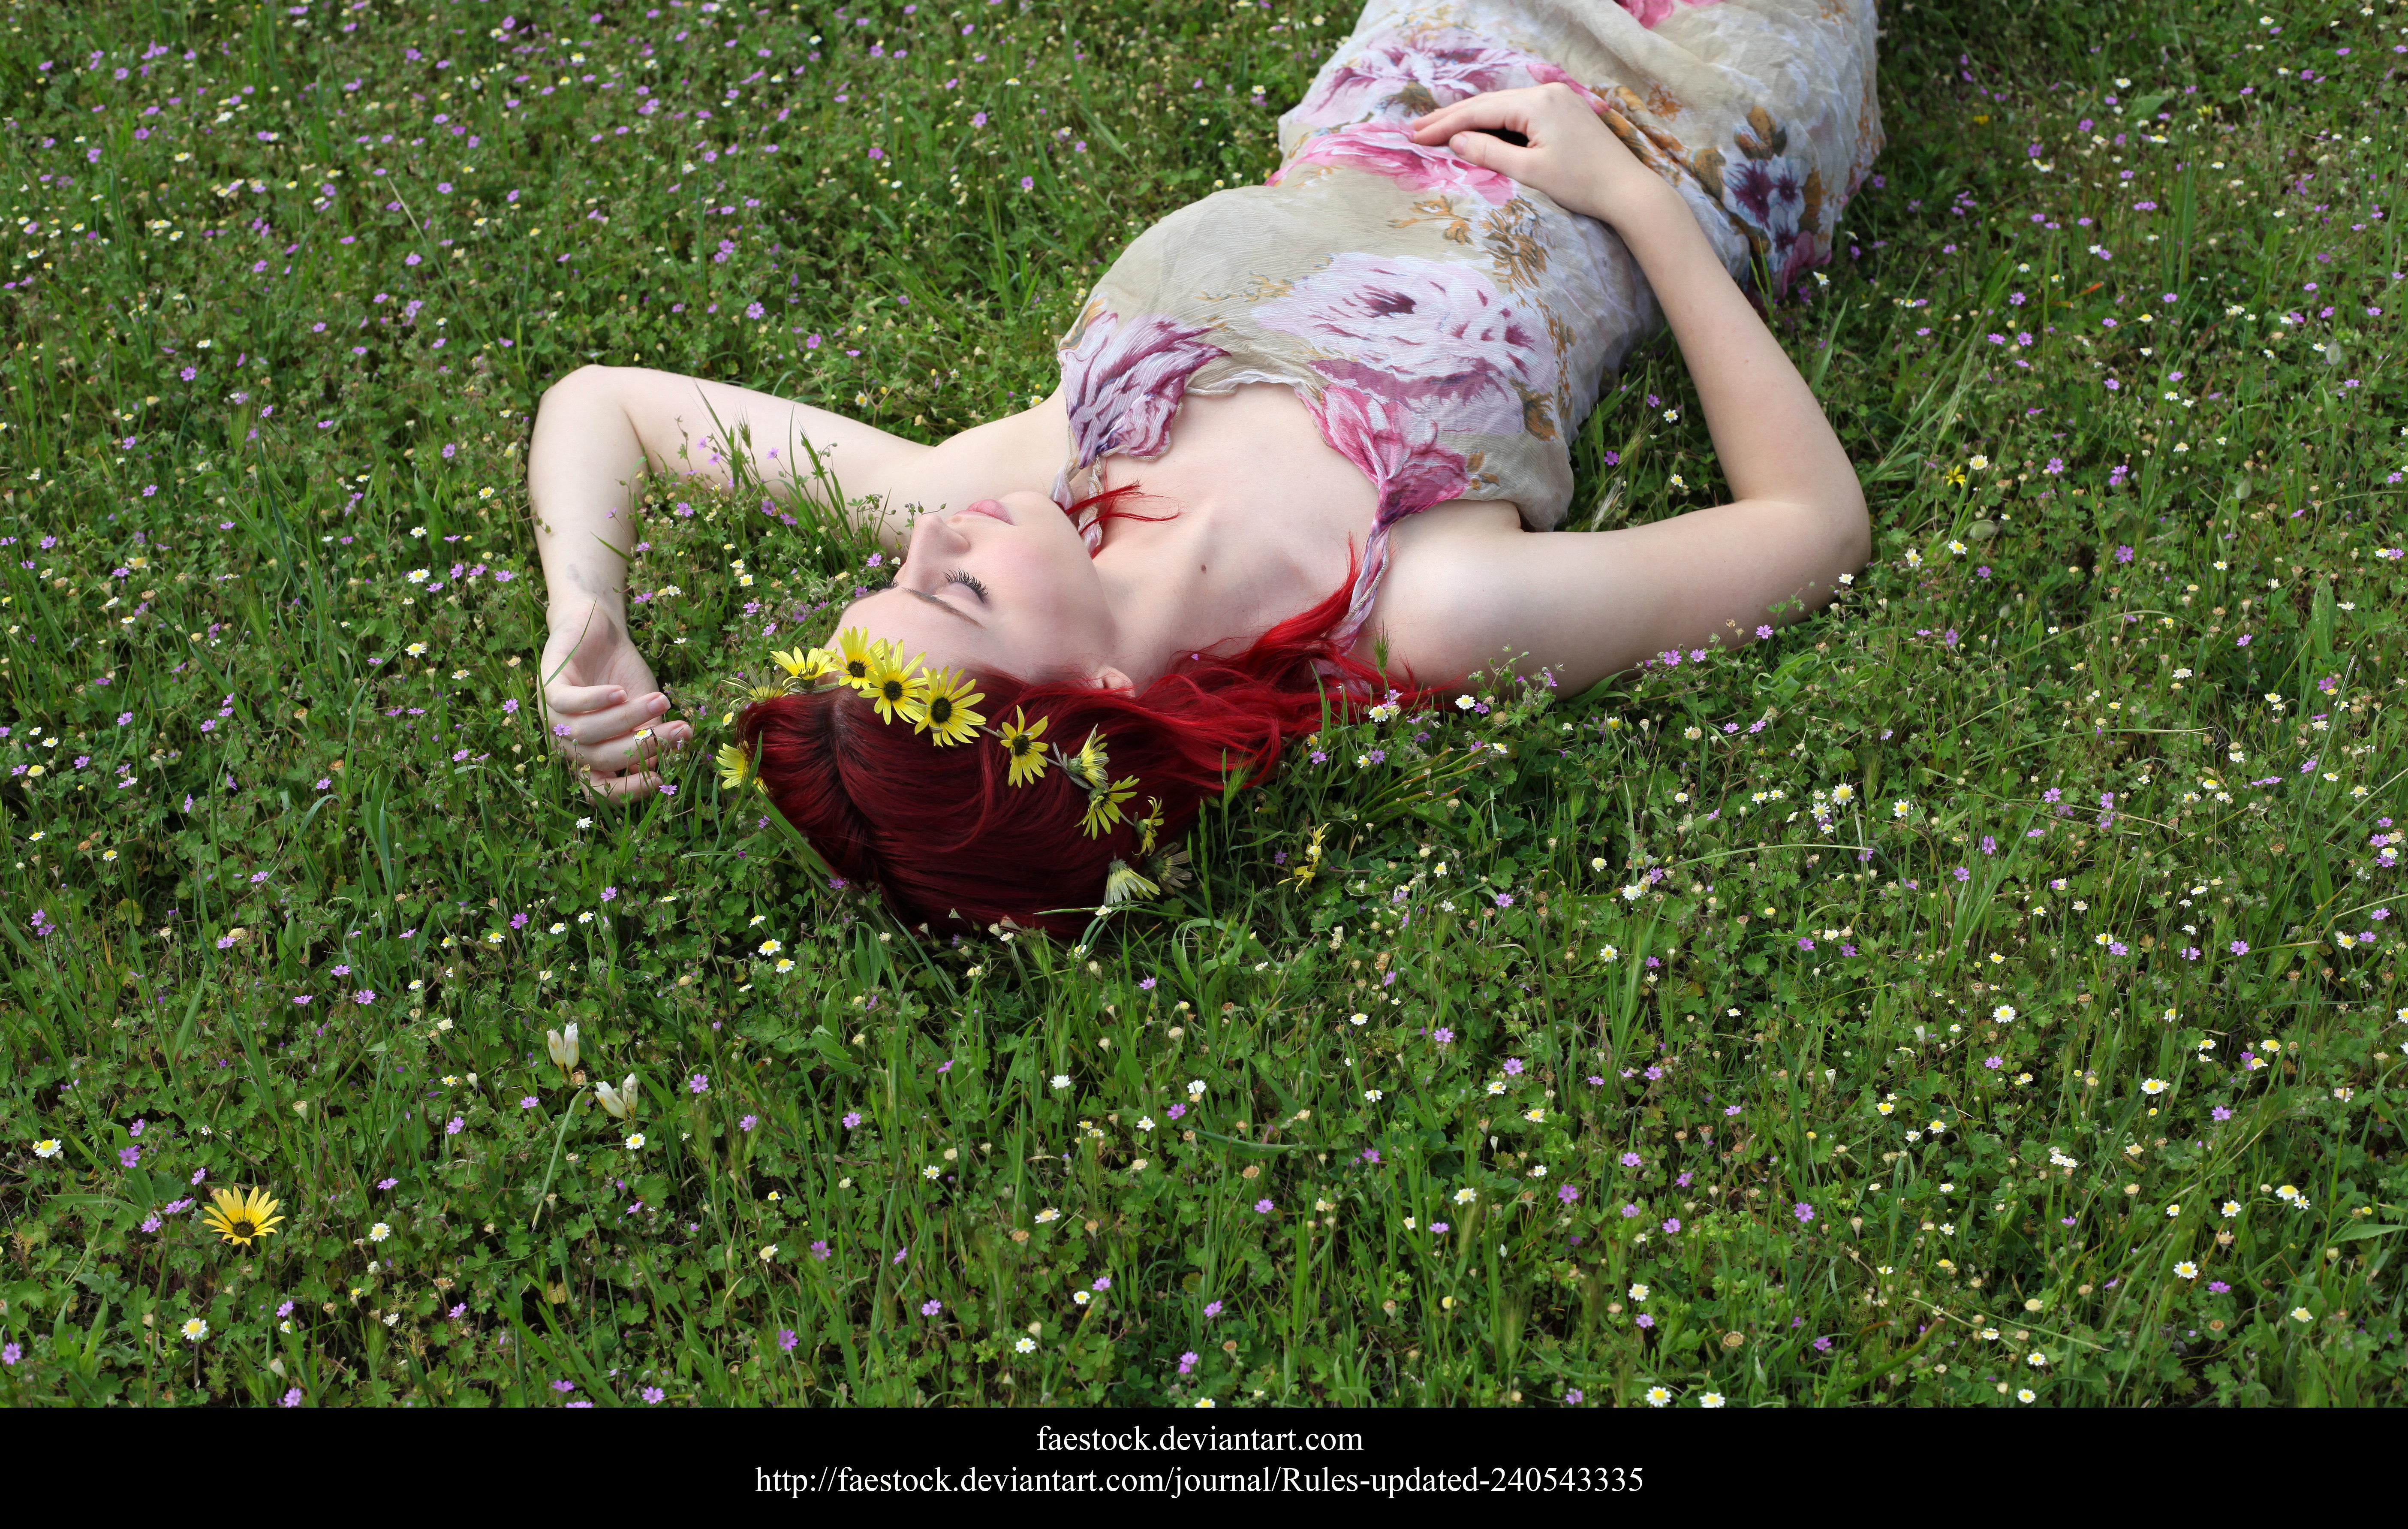 Spring5 by faestock